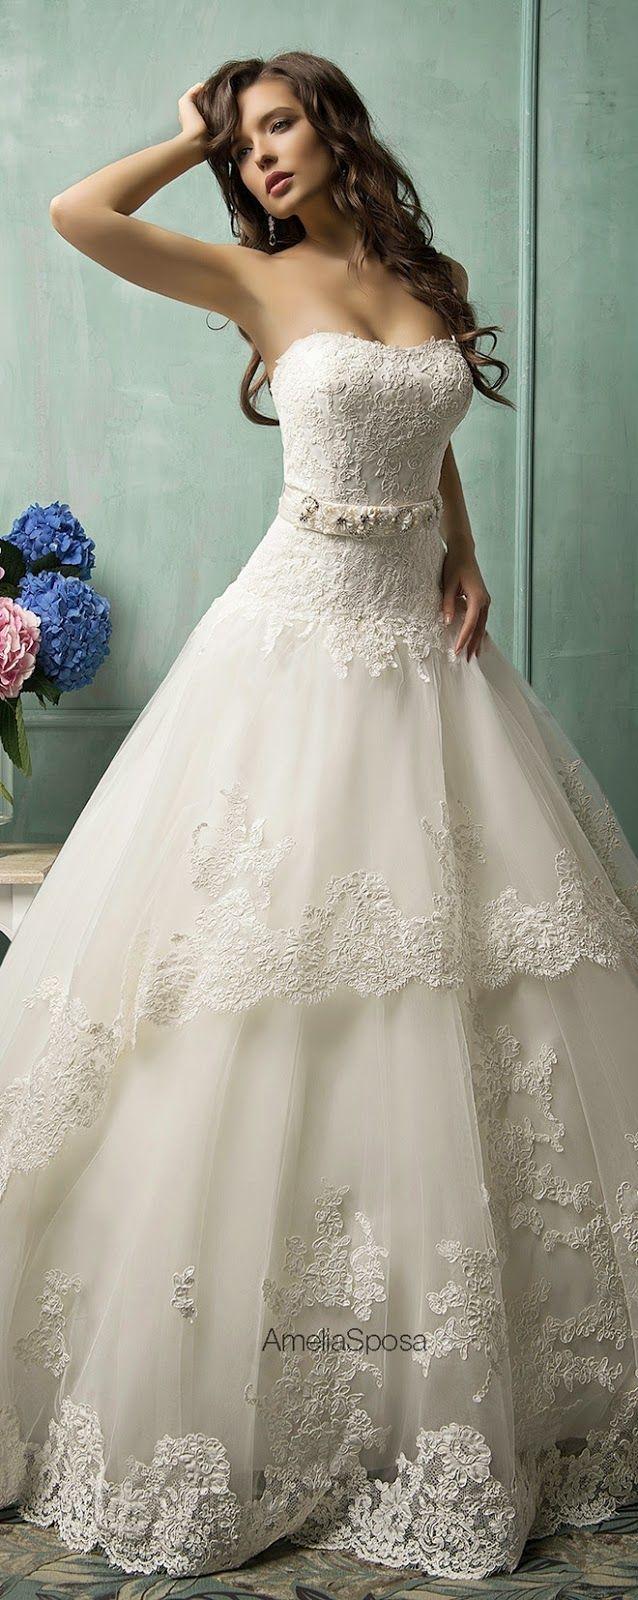 amelia sposa 2014 wedding dresses pinterest robe de